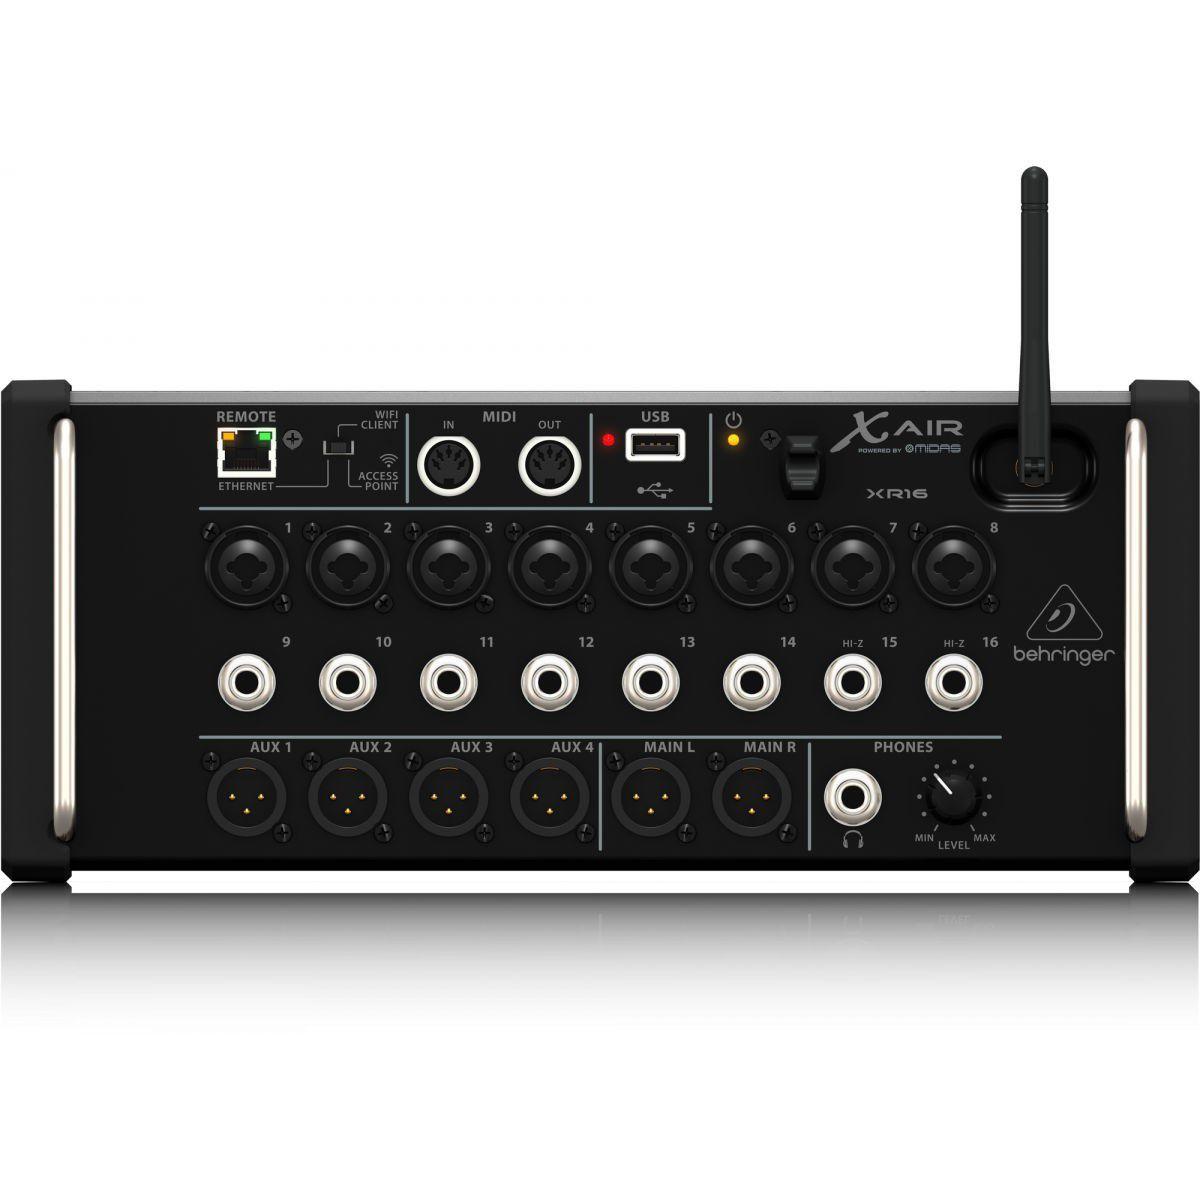 Mesa de Som Digital Behringer X Air XR16 USB 16 Canais